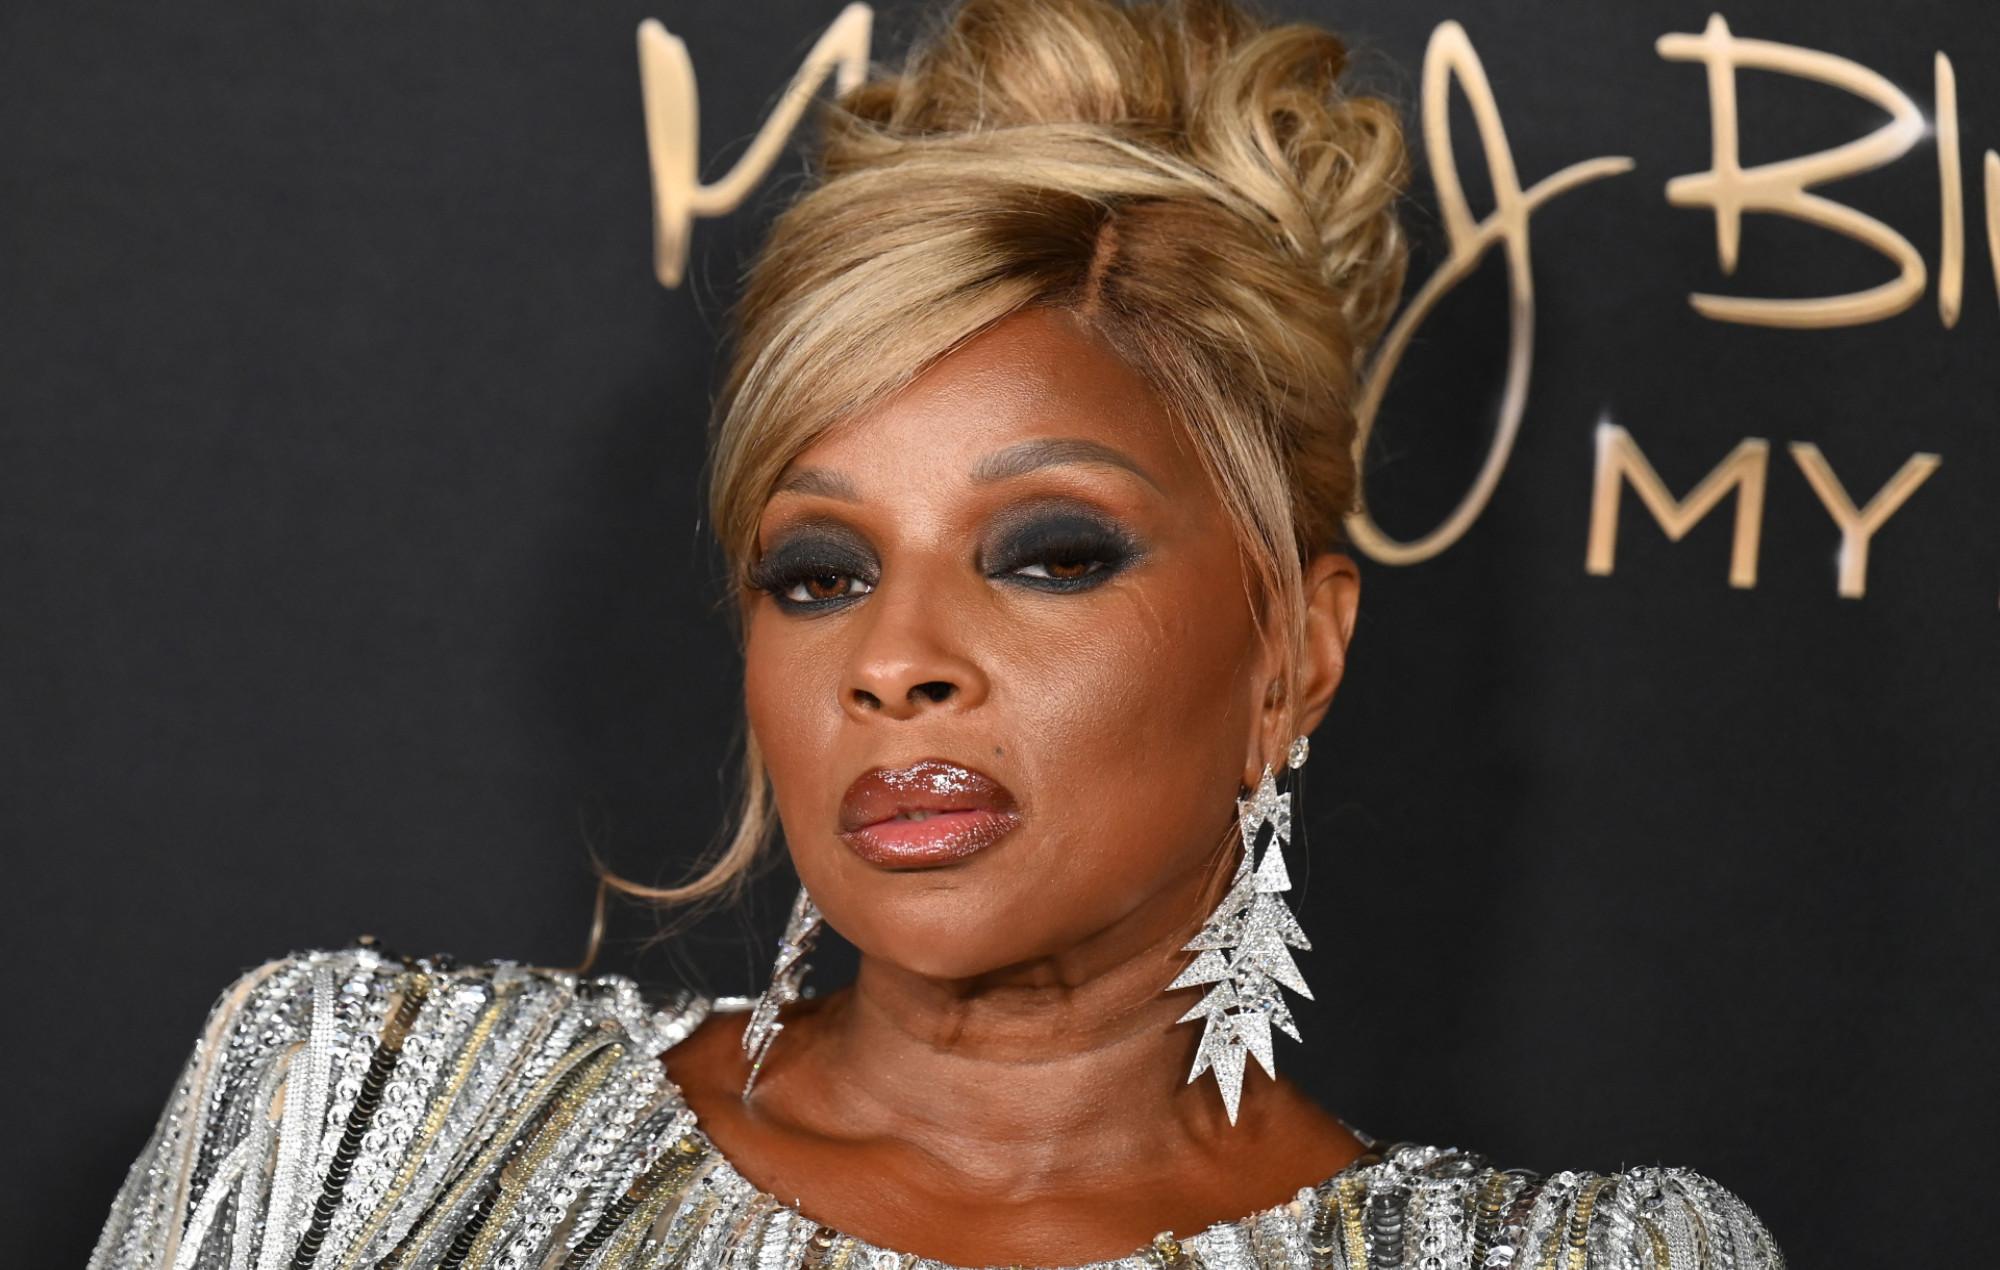 Mary J Blige Shuts Down Idea Of Taking Part In A Verzuz Battle